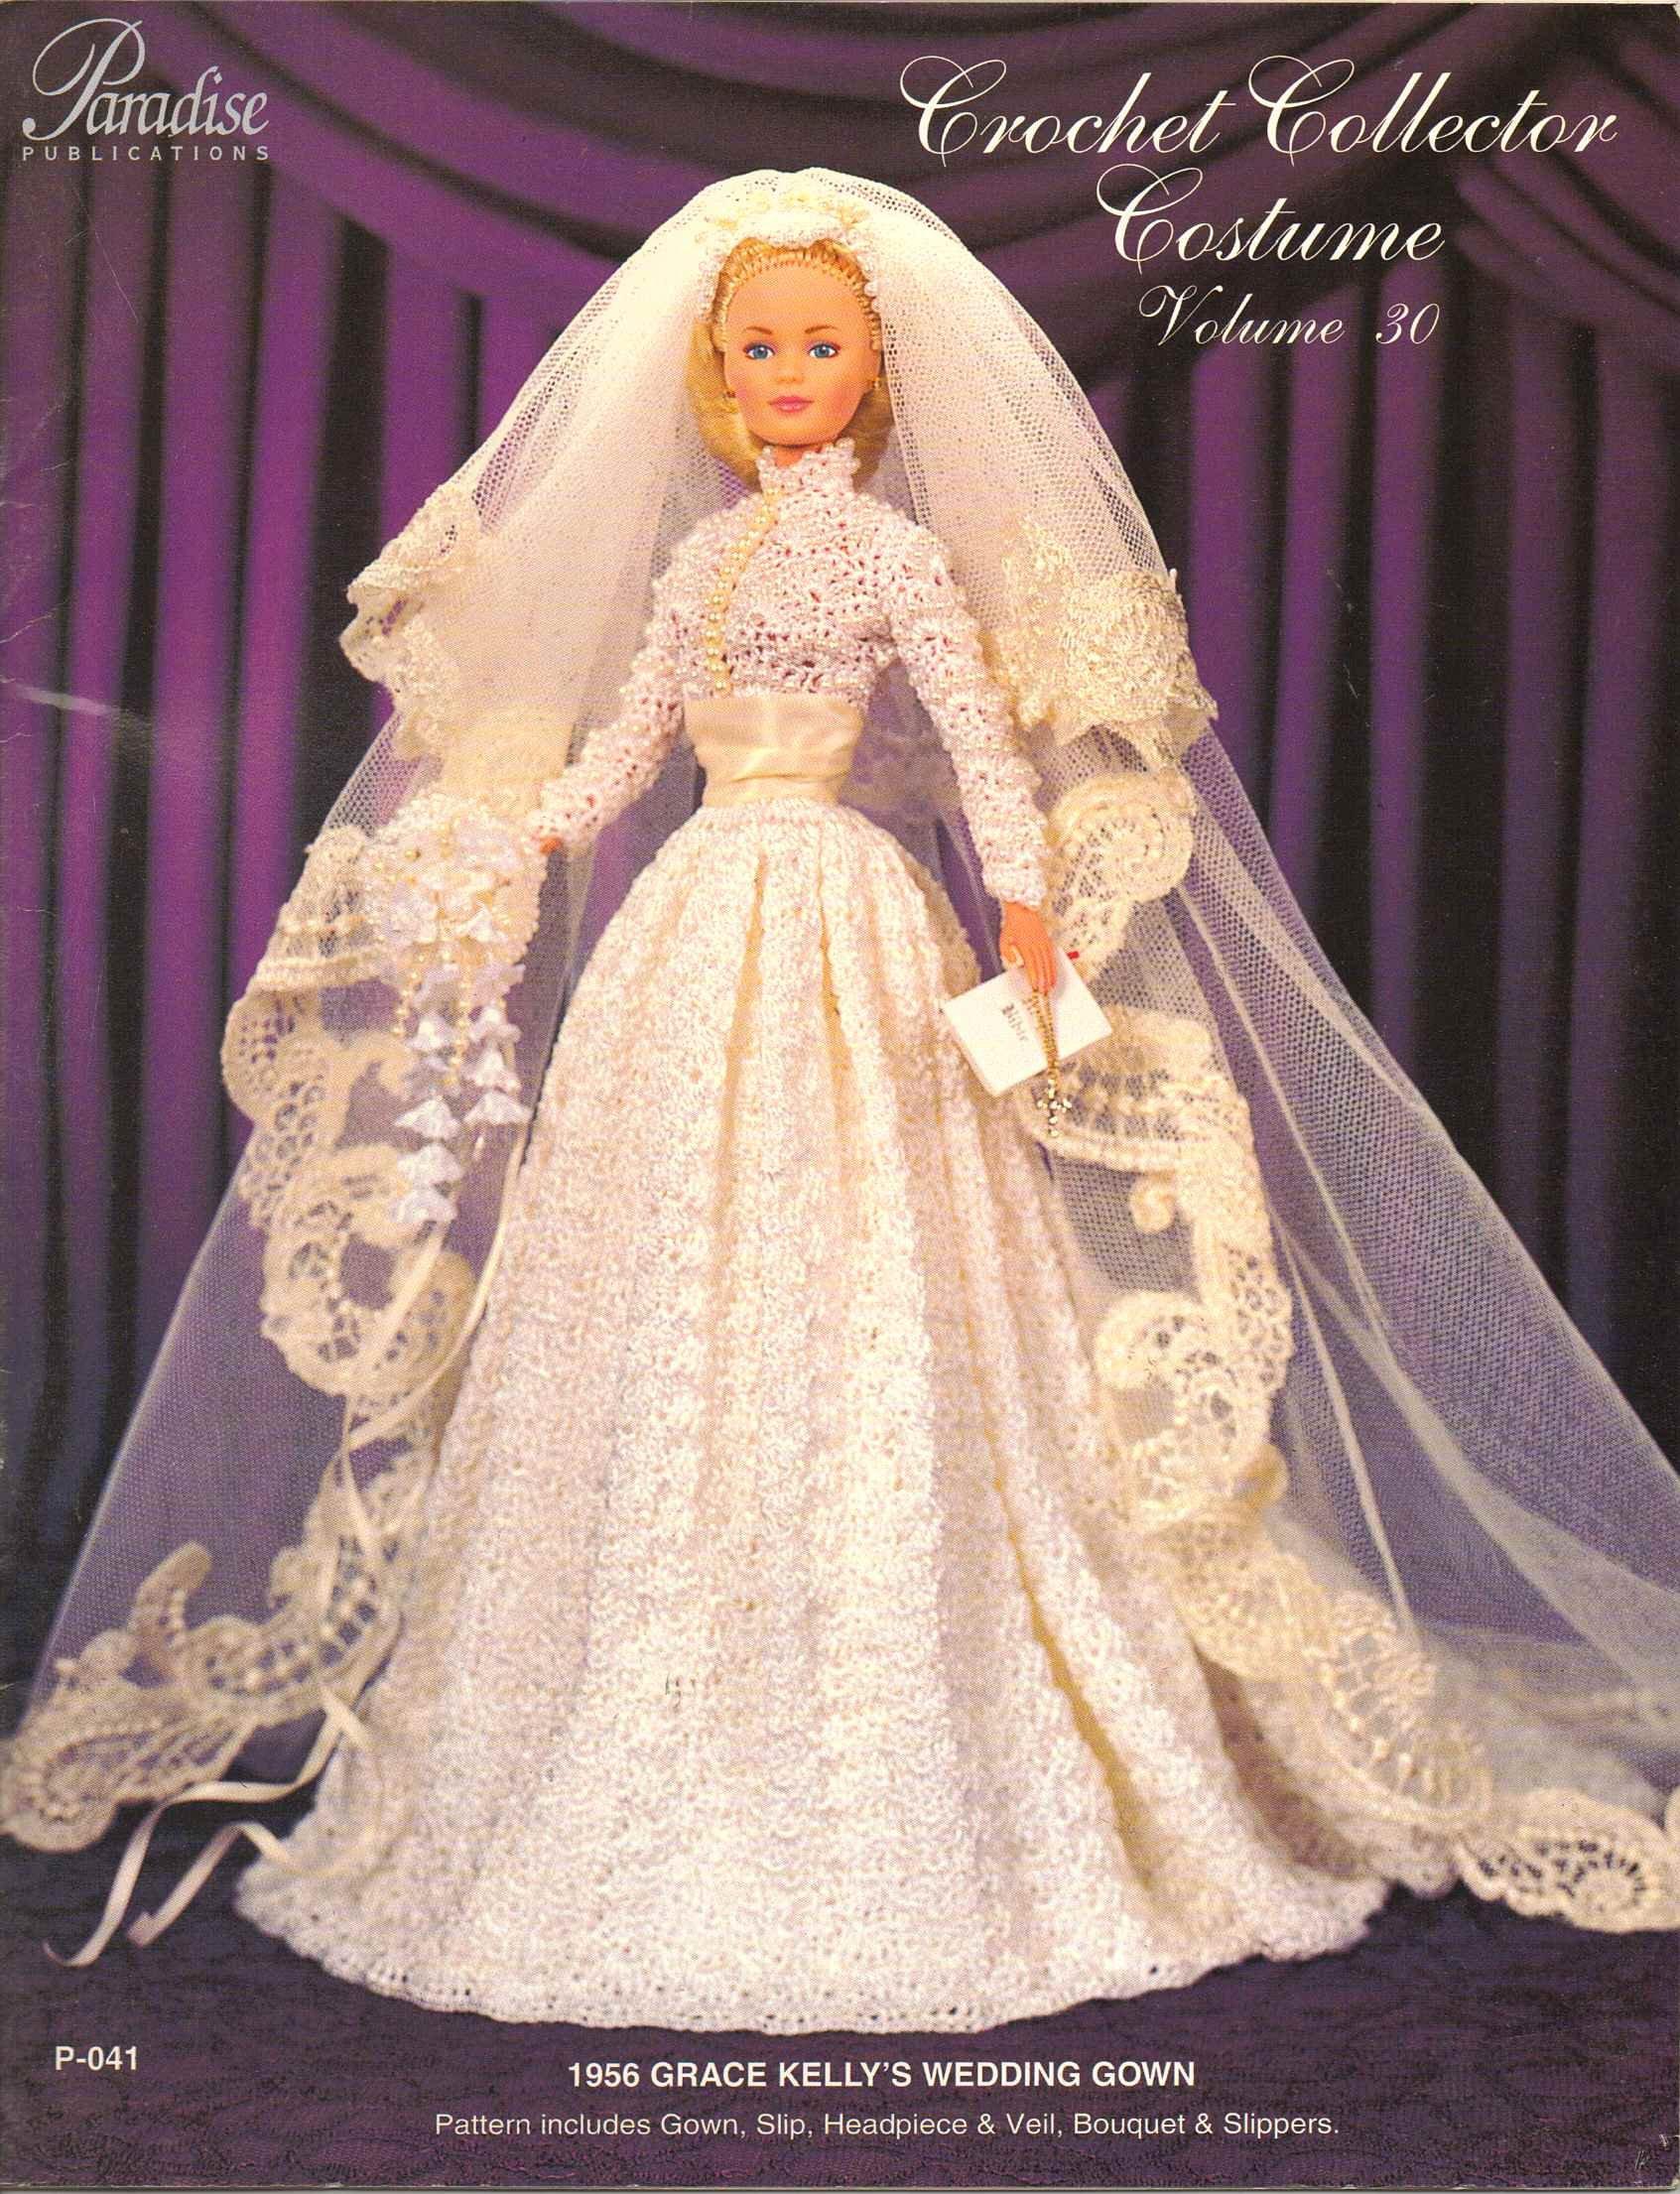 Crochet Collector Costume 1956 Grace Kelly\'s Wedding Gown: Sandra ...